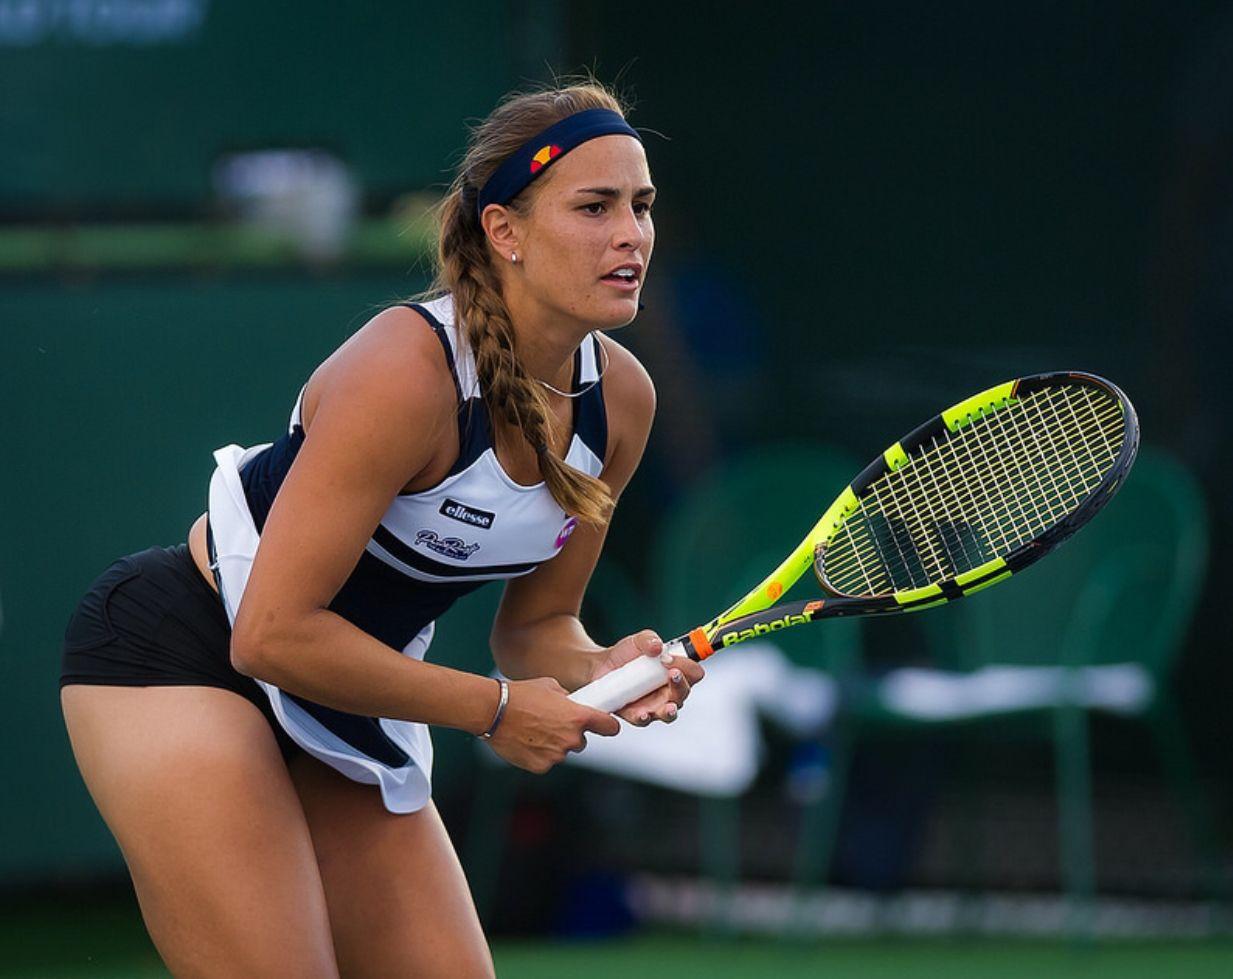 Michelle Puig Tennis Players Female Monica Puig Tennis Players